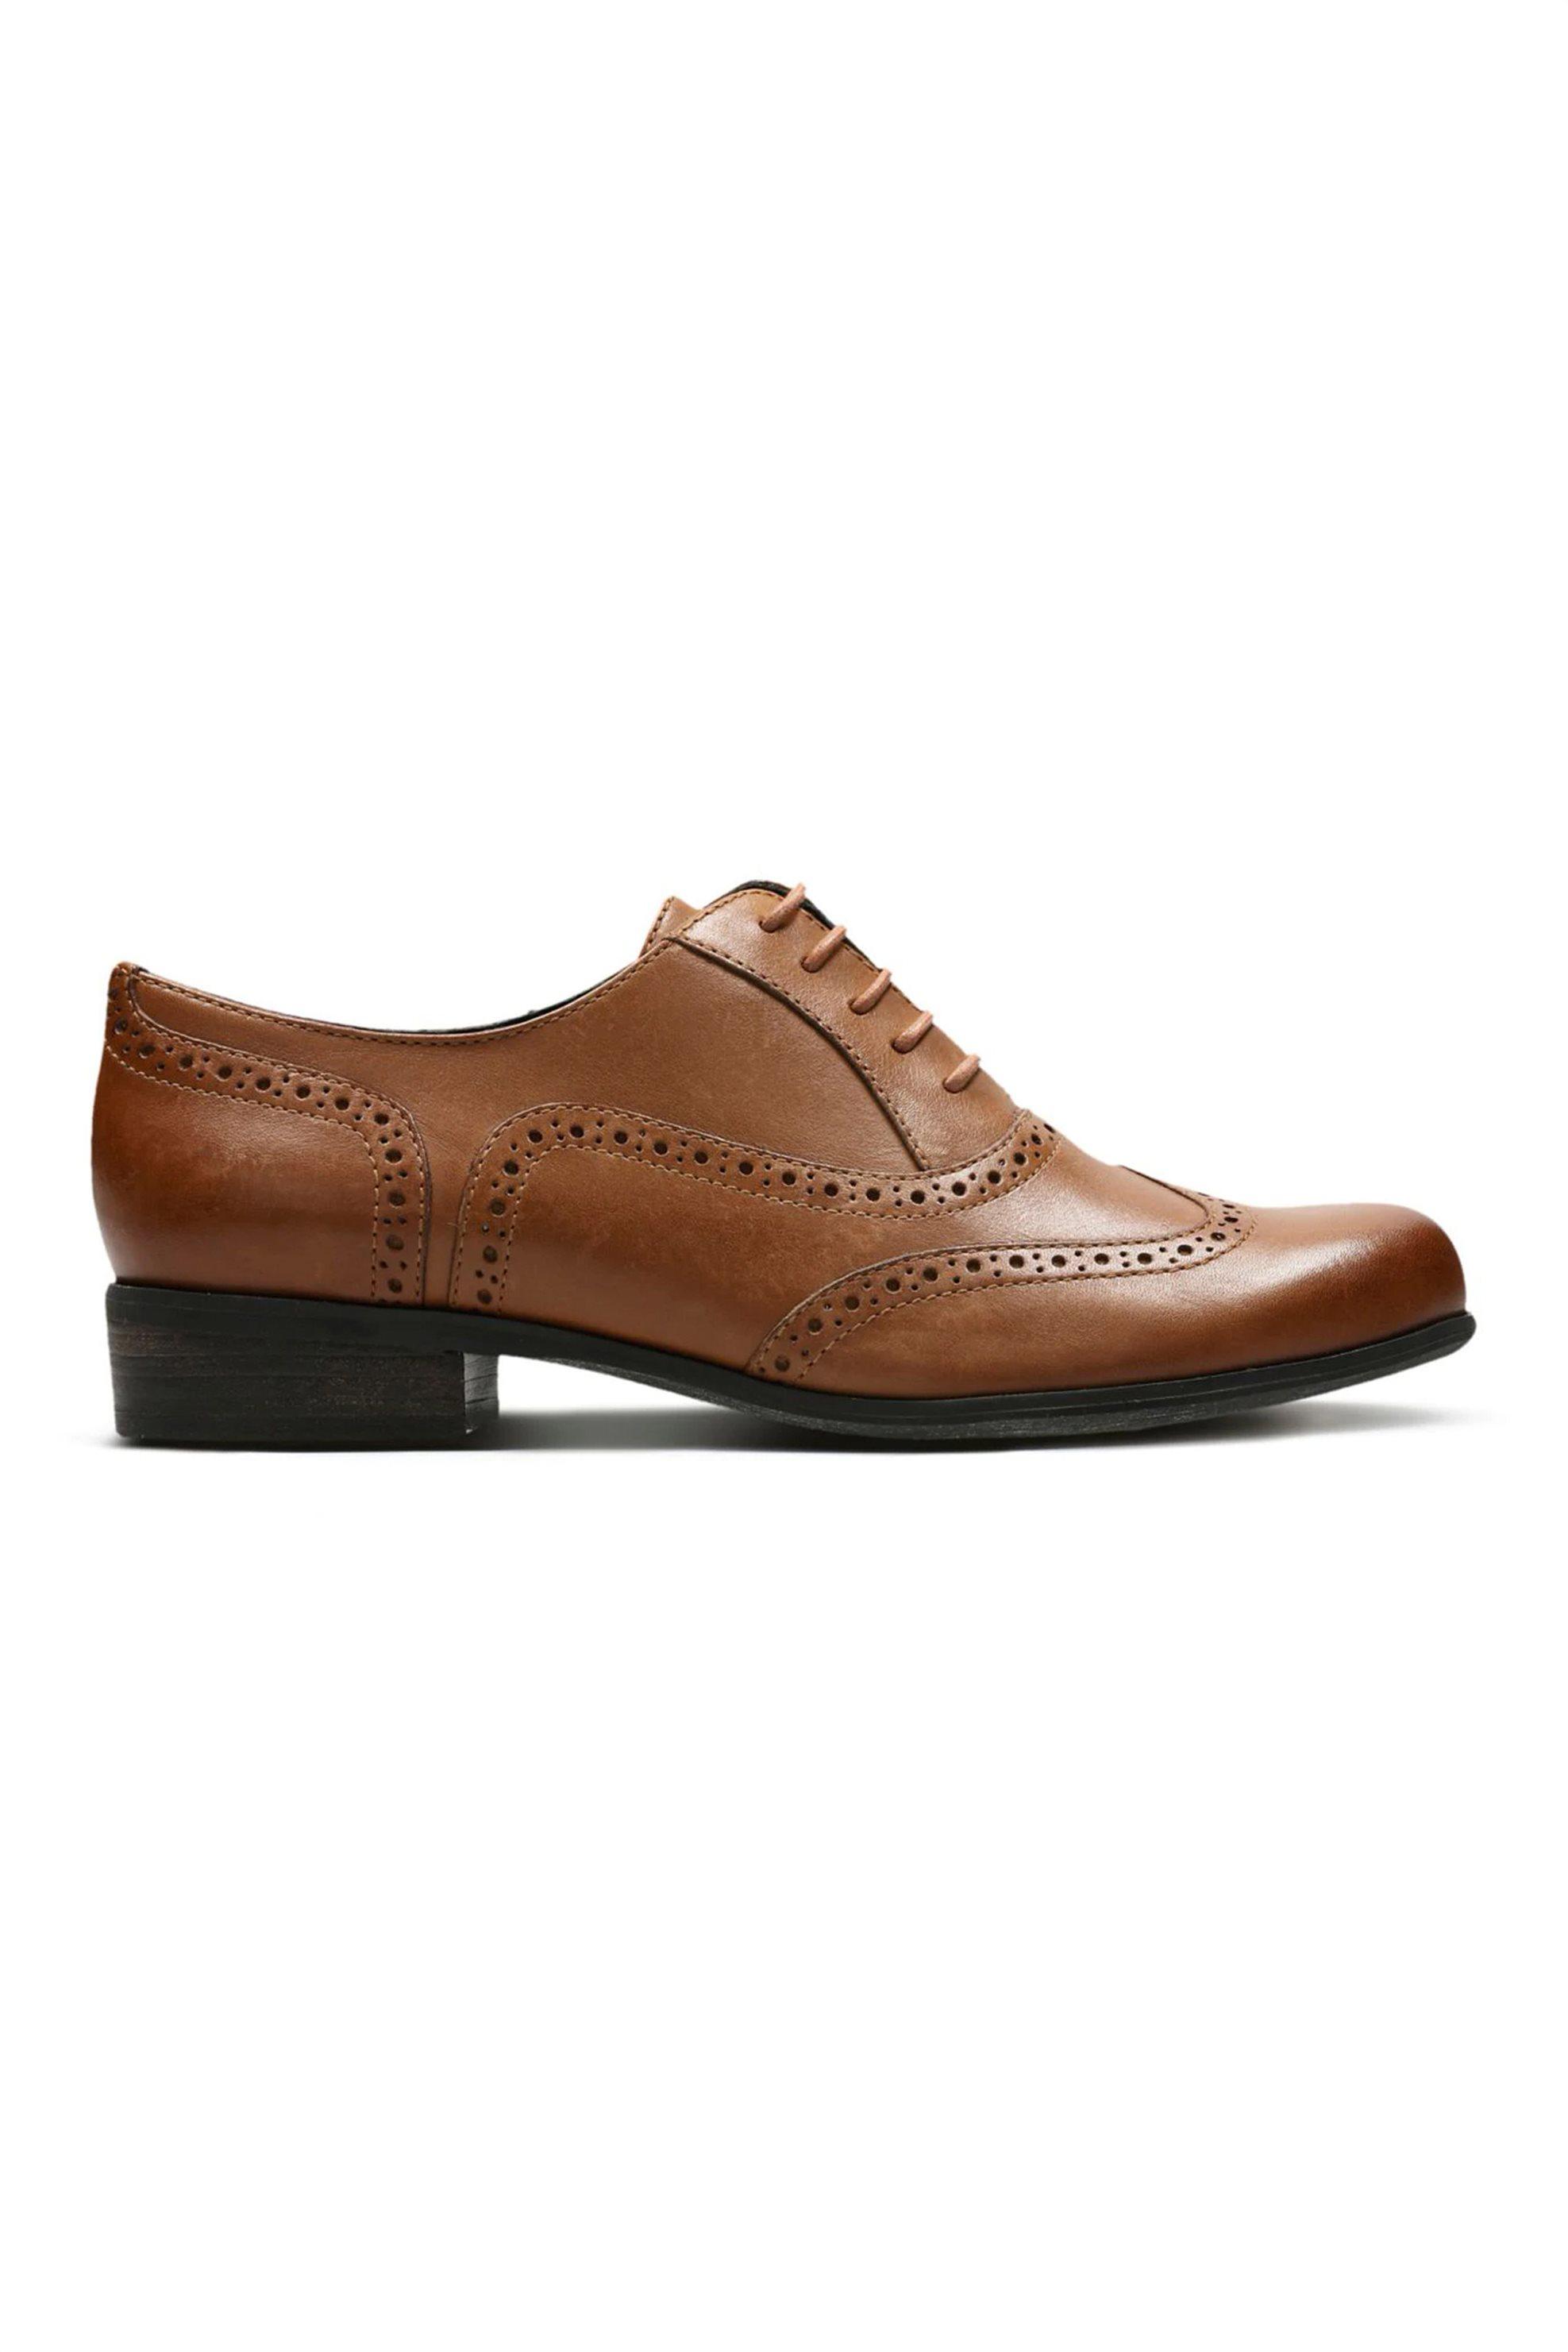 Clarks γυναικεία παπούτσια λουστρίνι Oxford «Hamble Oak» – 20350674 – Ταμπά